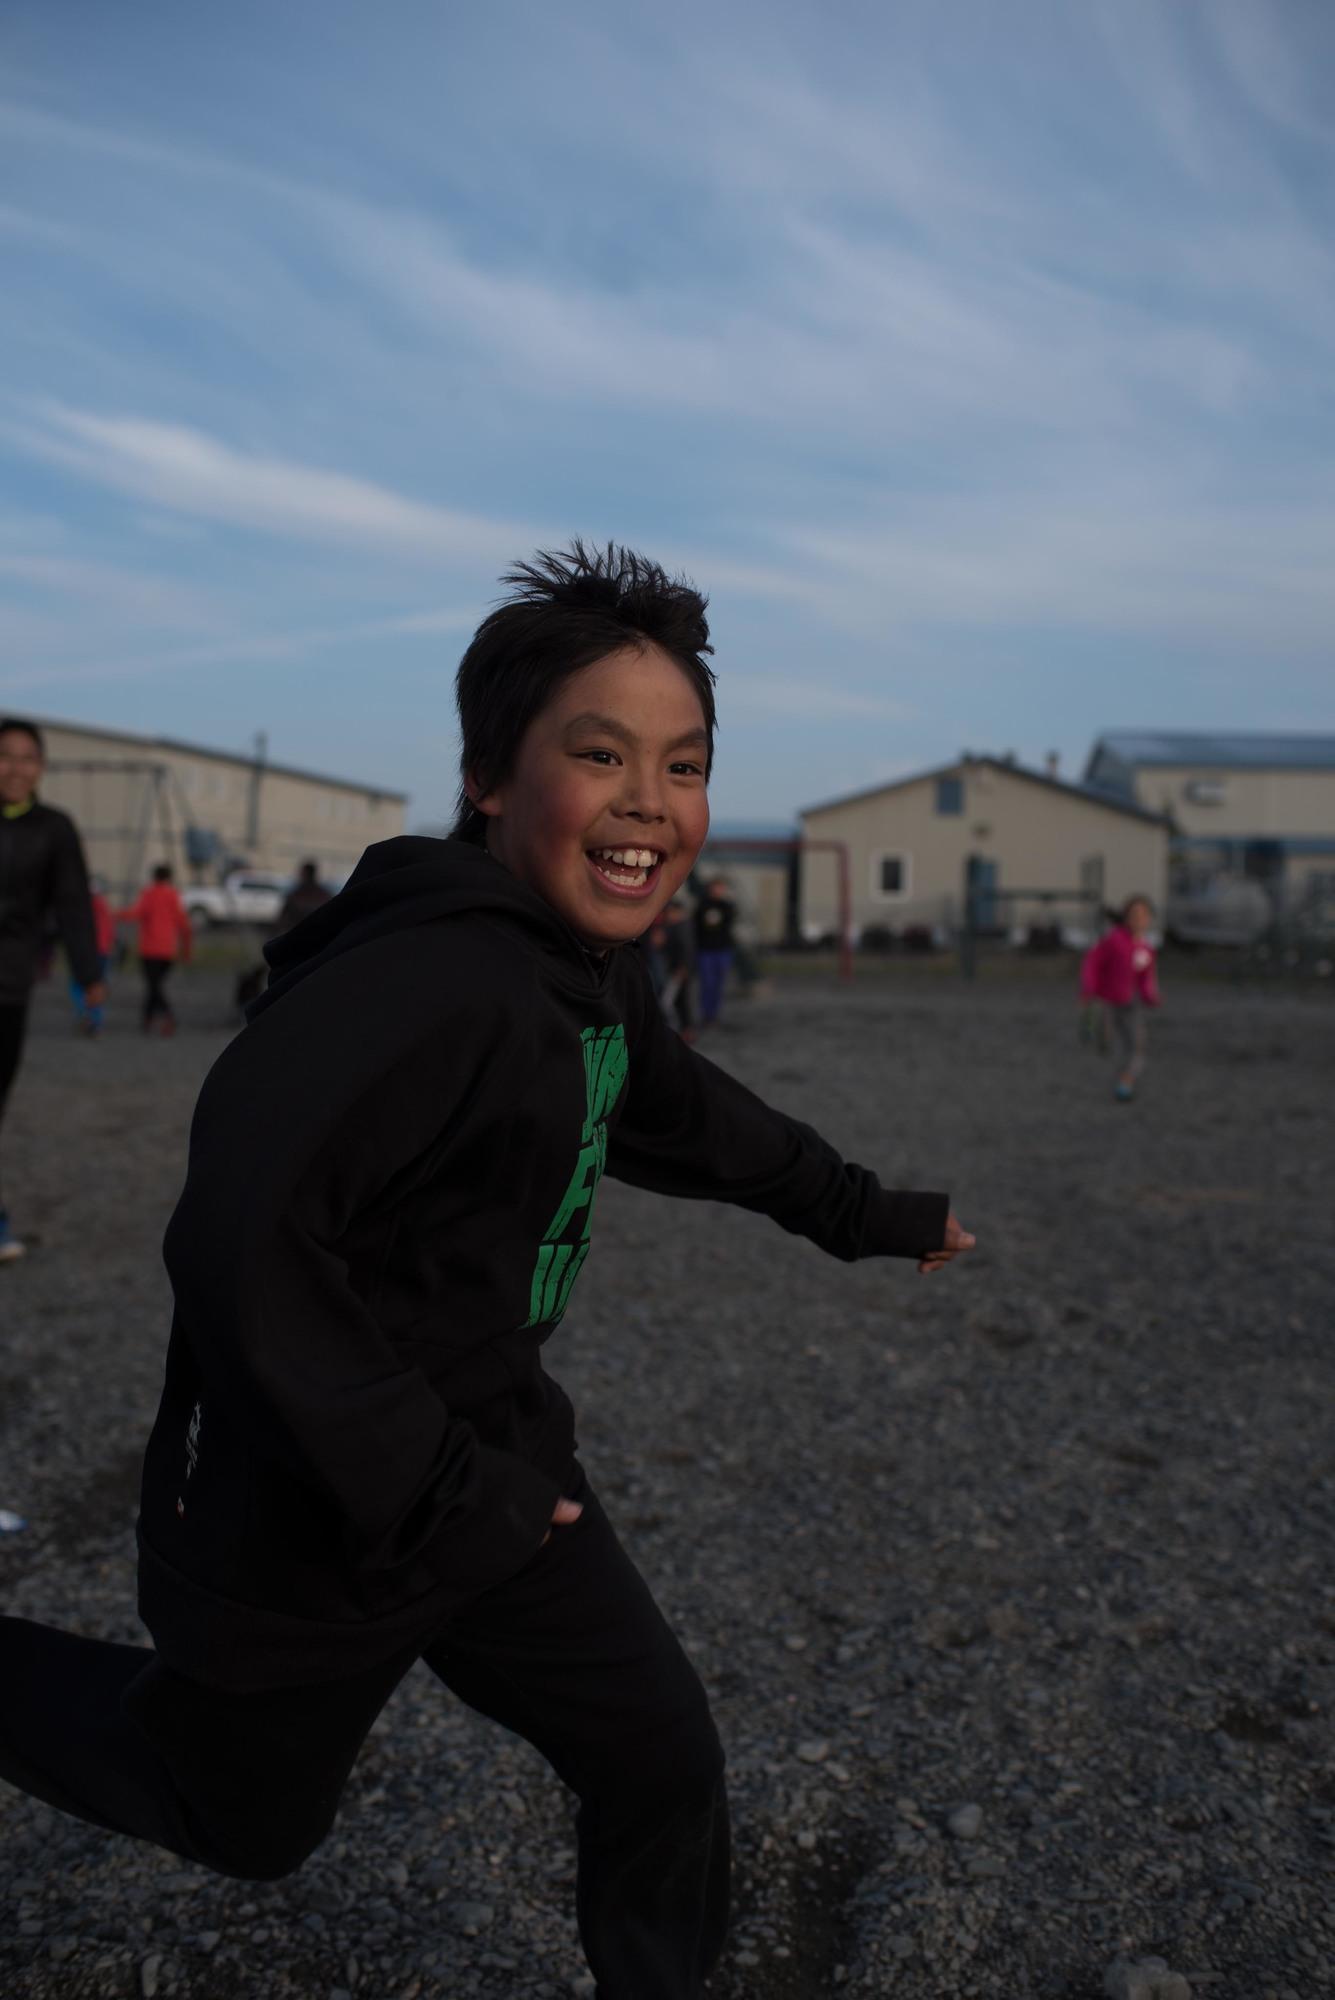 Alaska child playing outside at school